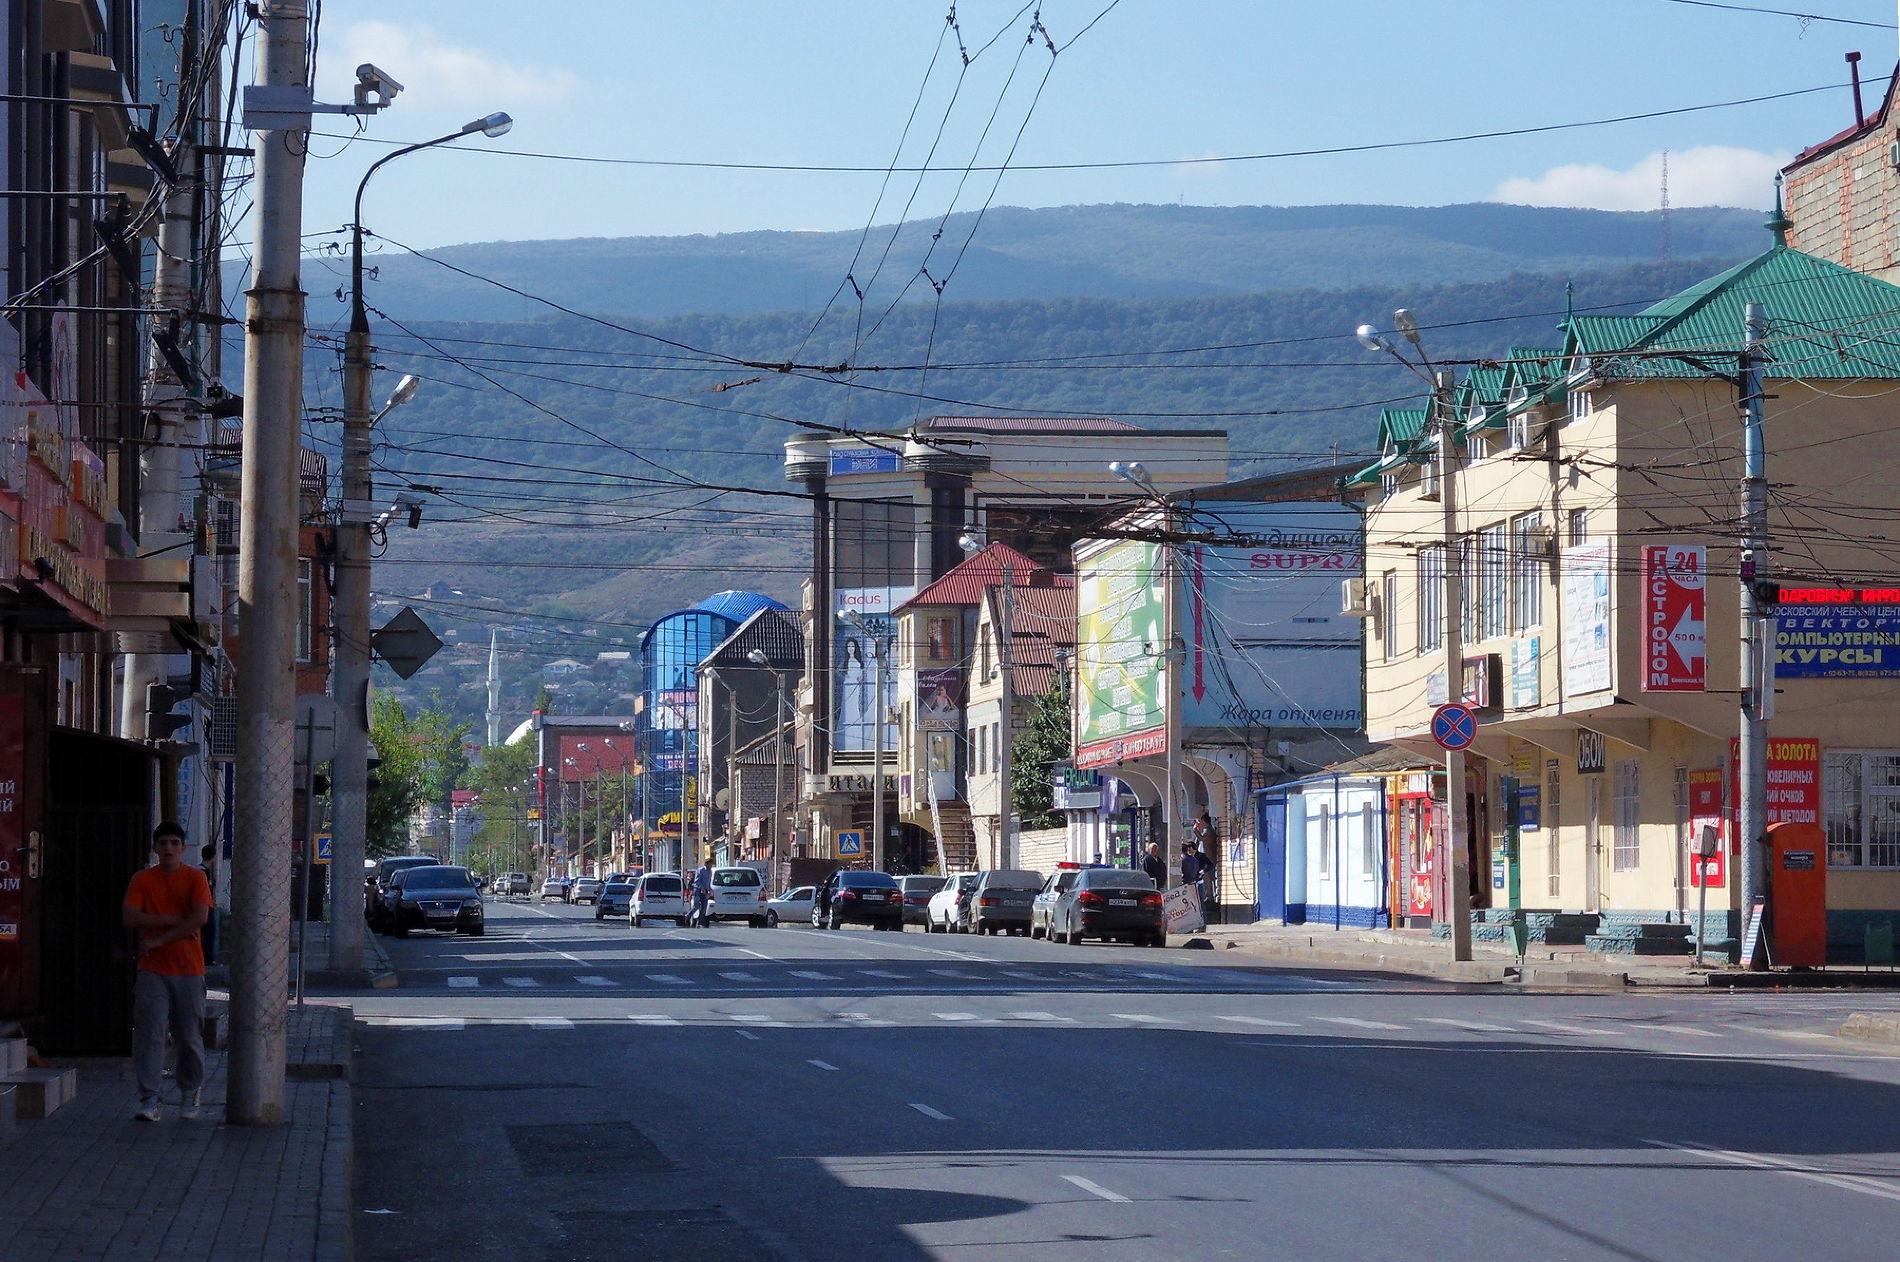 ВМахачкале возникла 2-ая улица имени Ахмата Кадырова